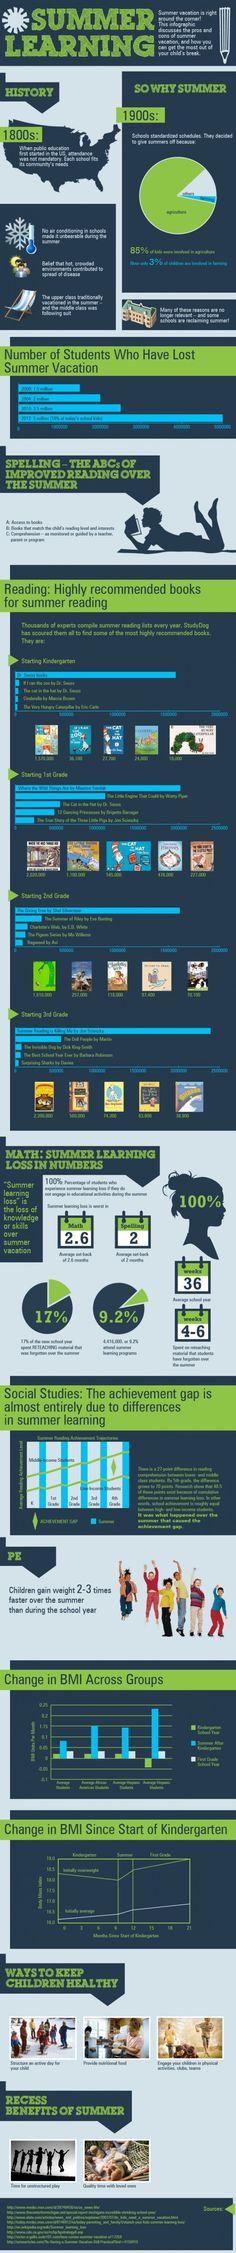 Summer Learning & #summerslide Infographic